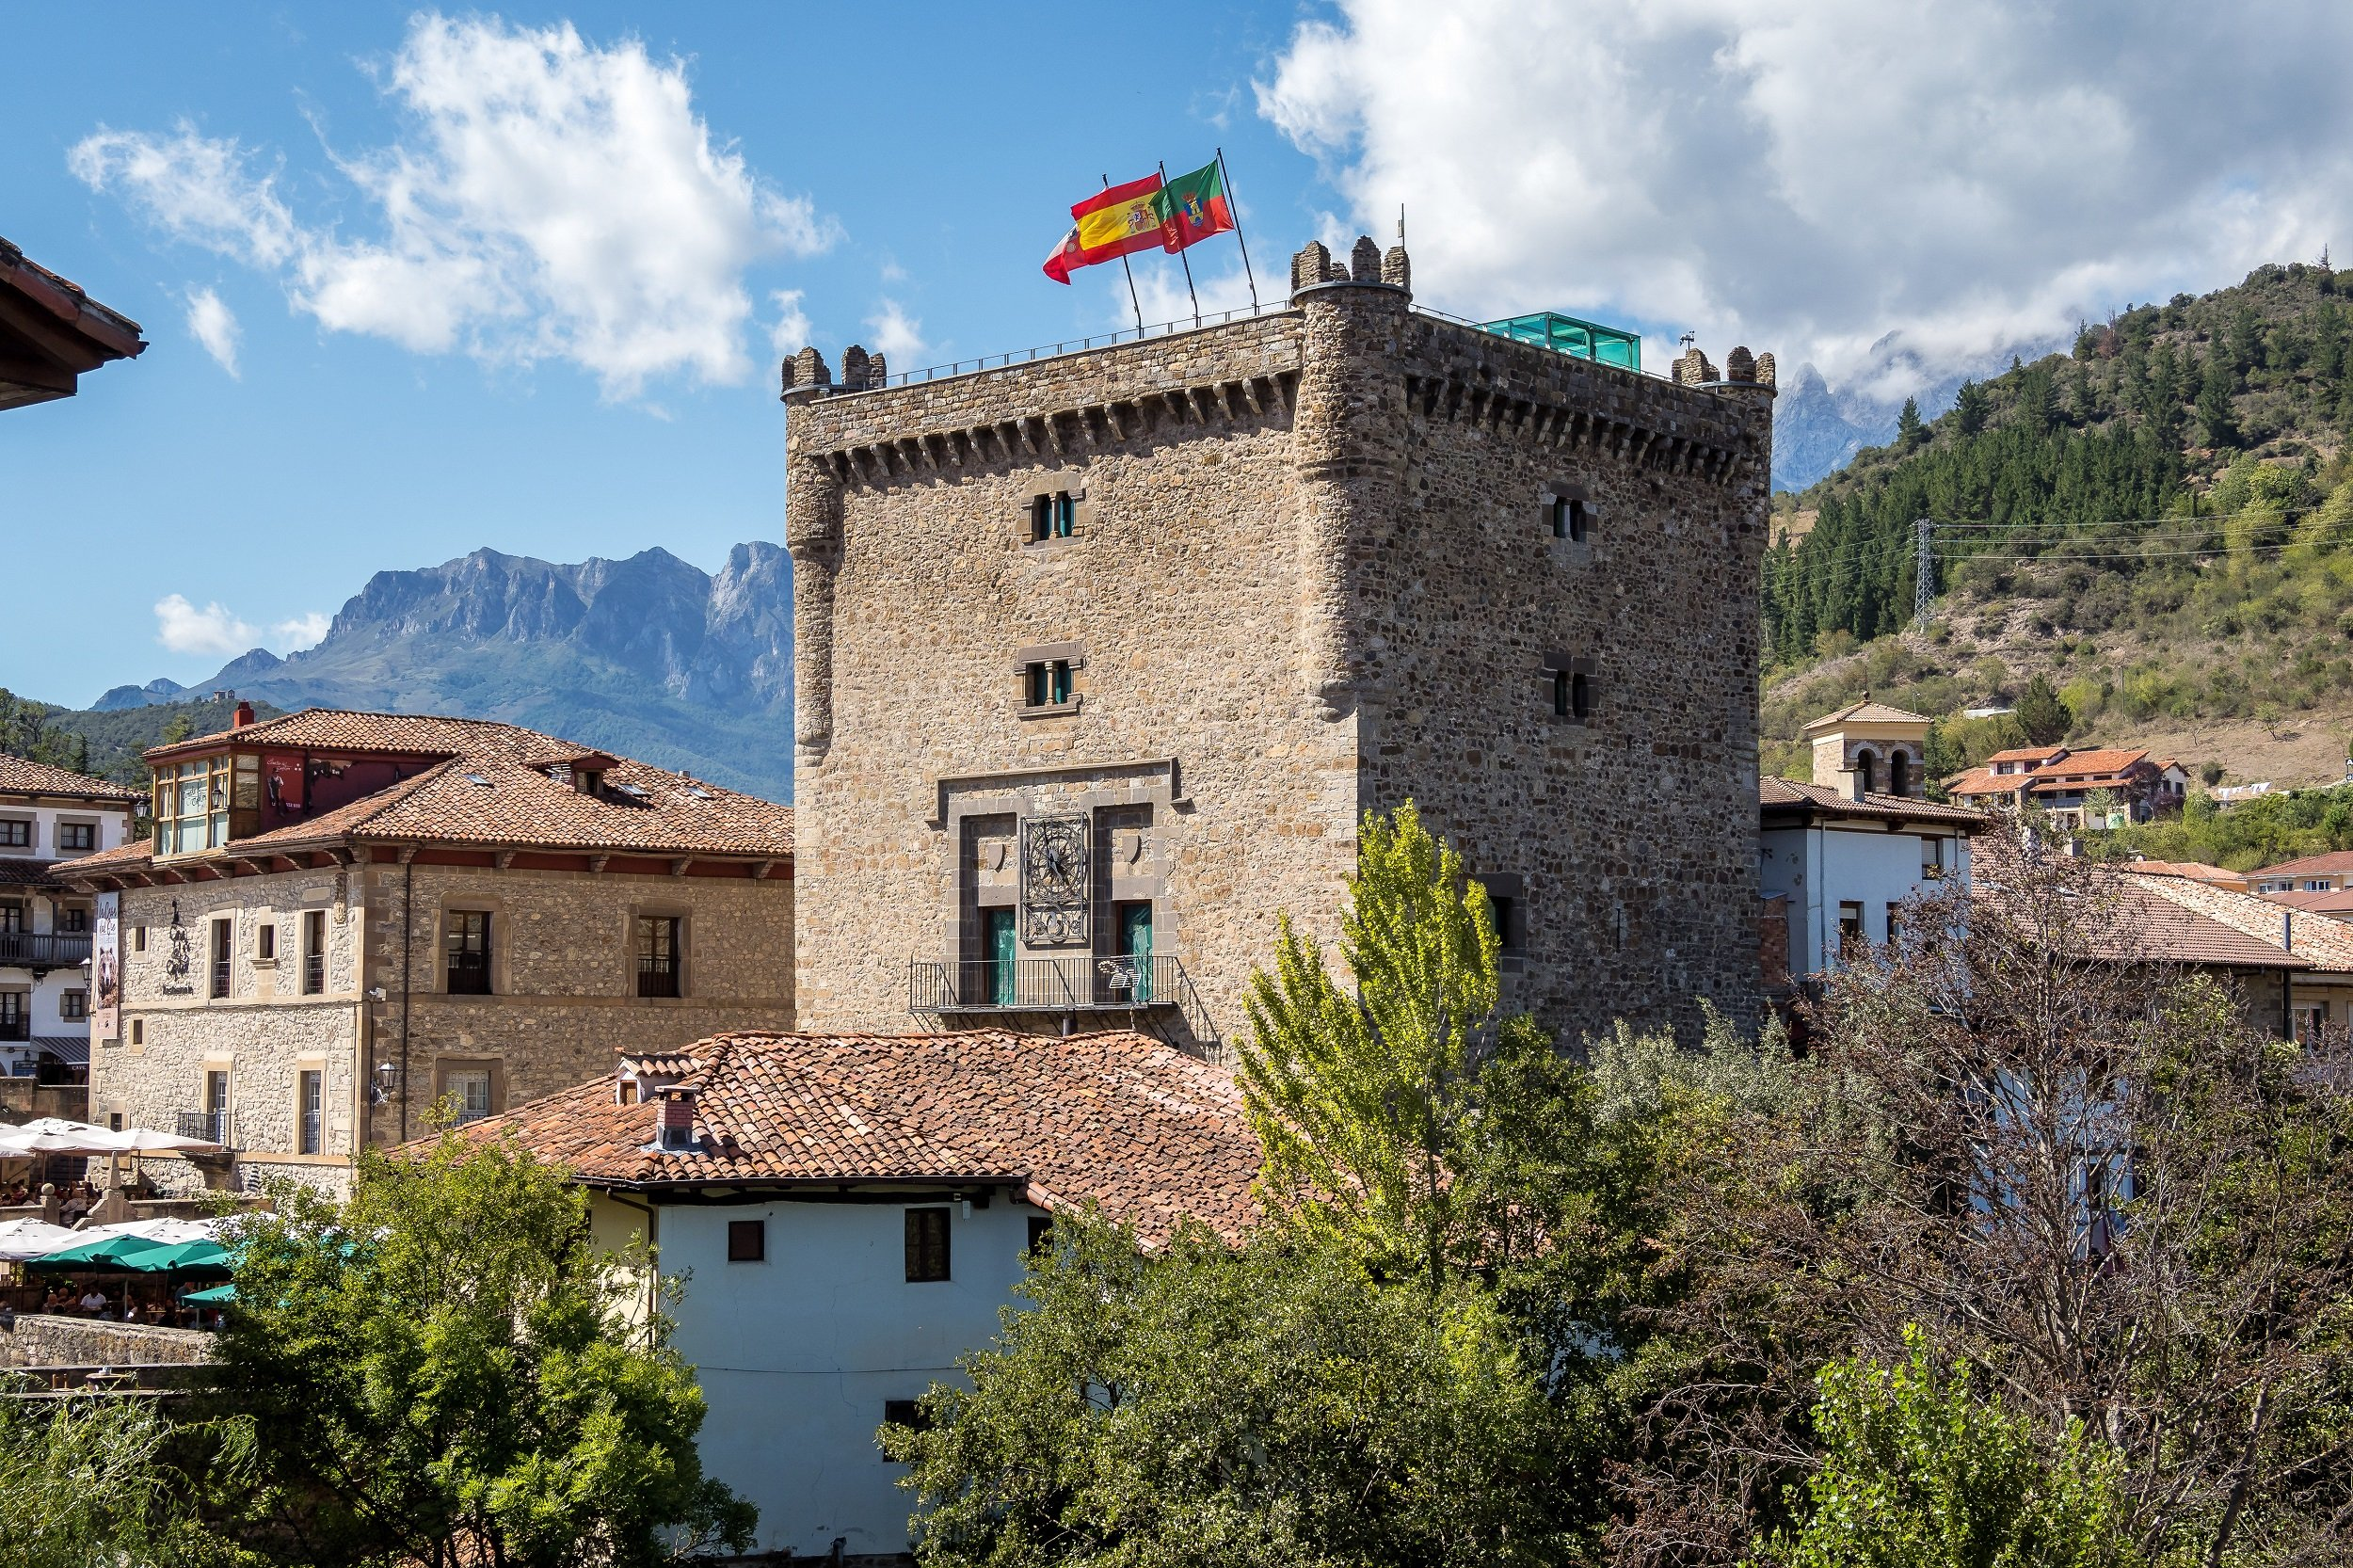 Monastery Of Santo Toribio & San Sebastián De Garabandal Pilgrimage Tour From Santander, Torrelavega & Unquera_2